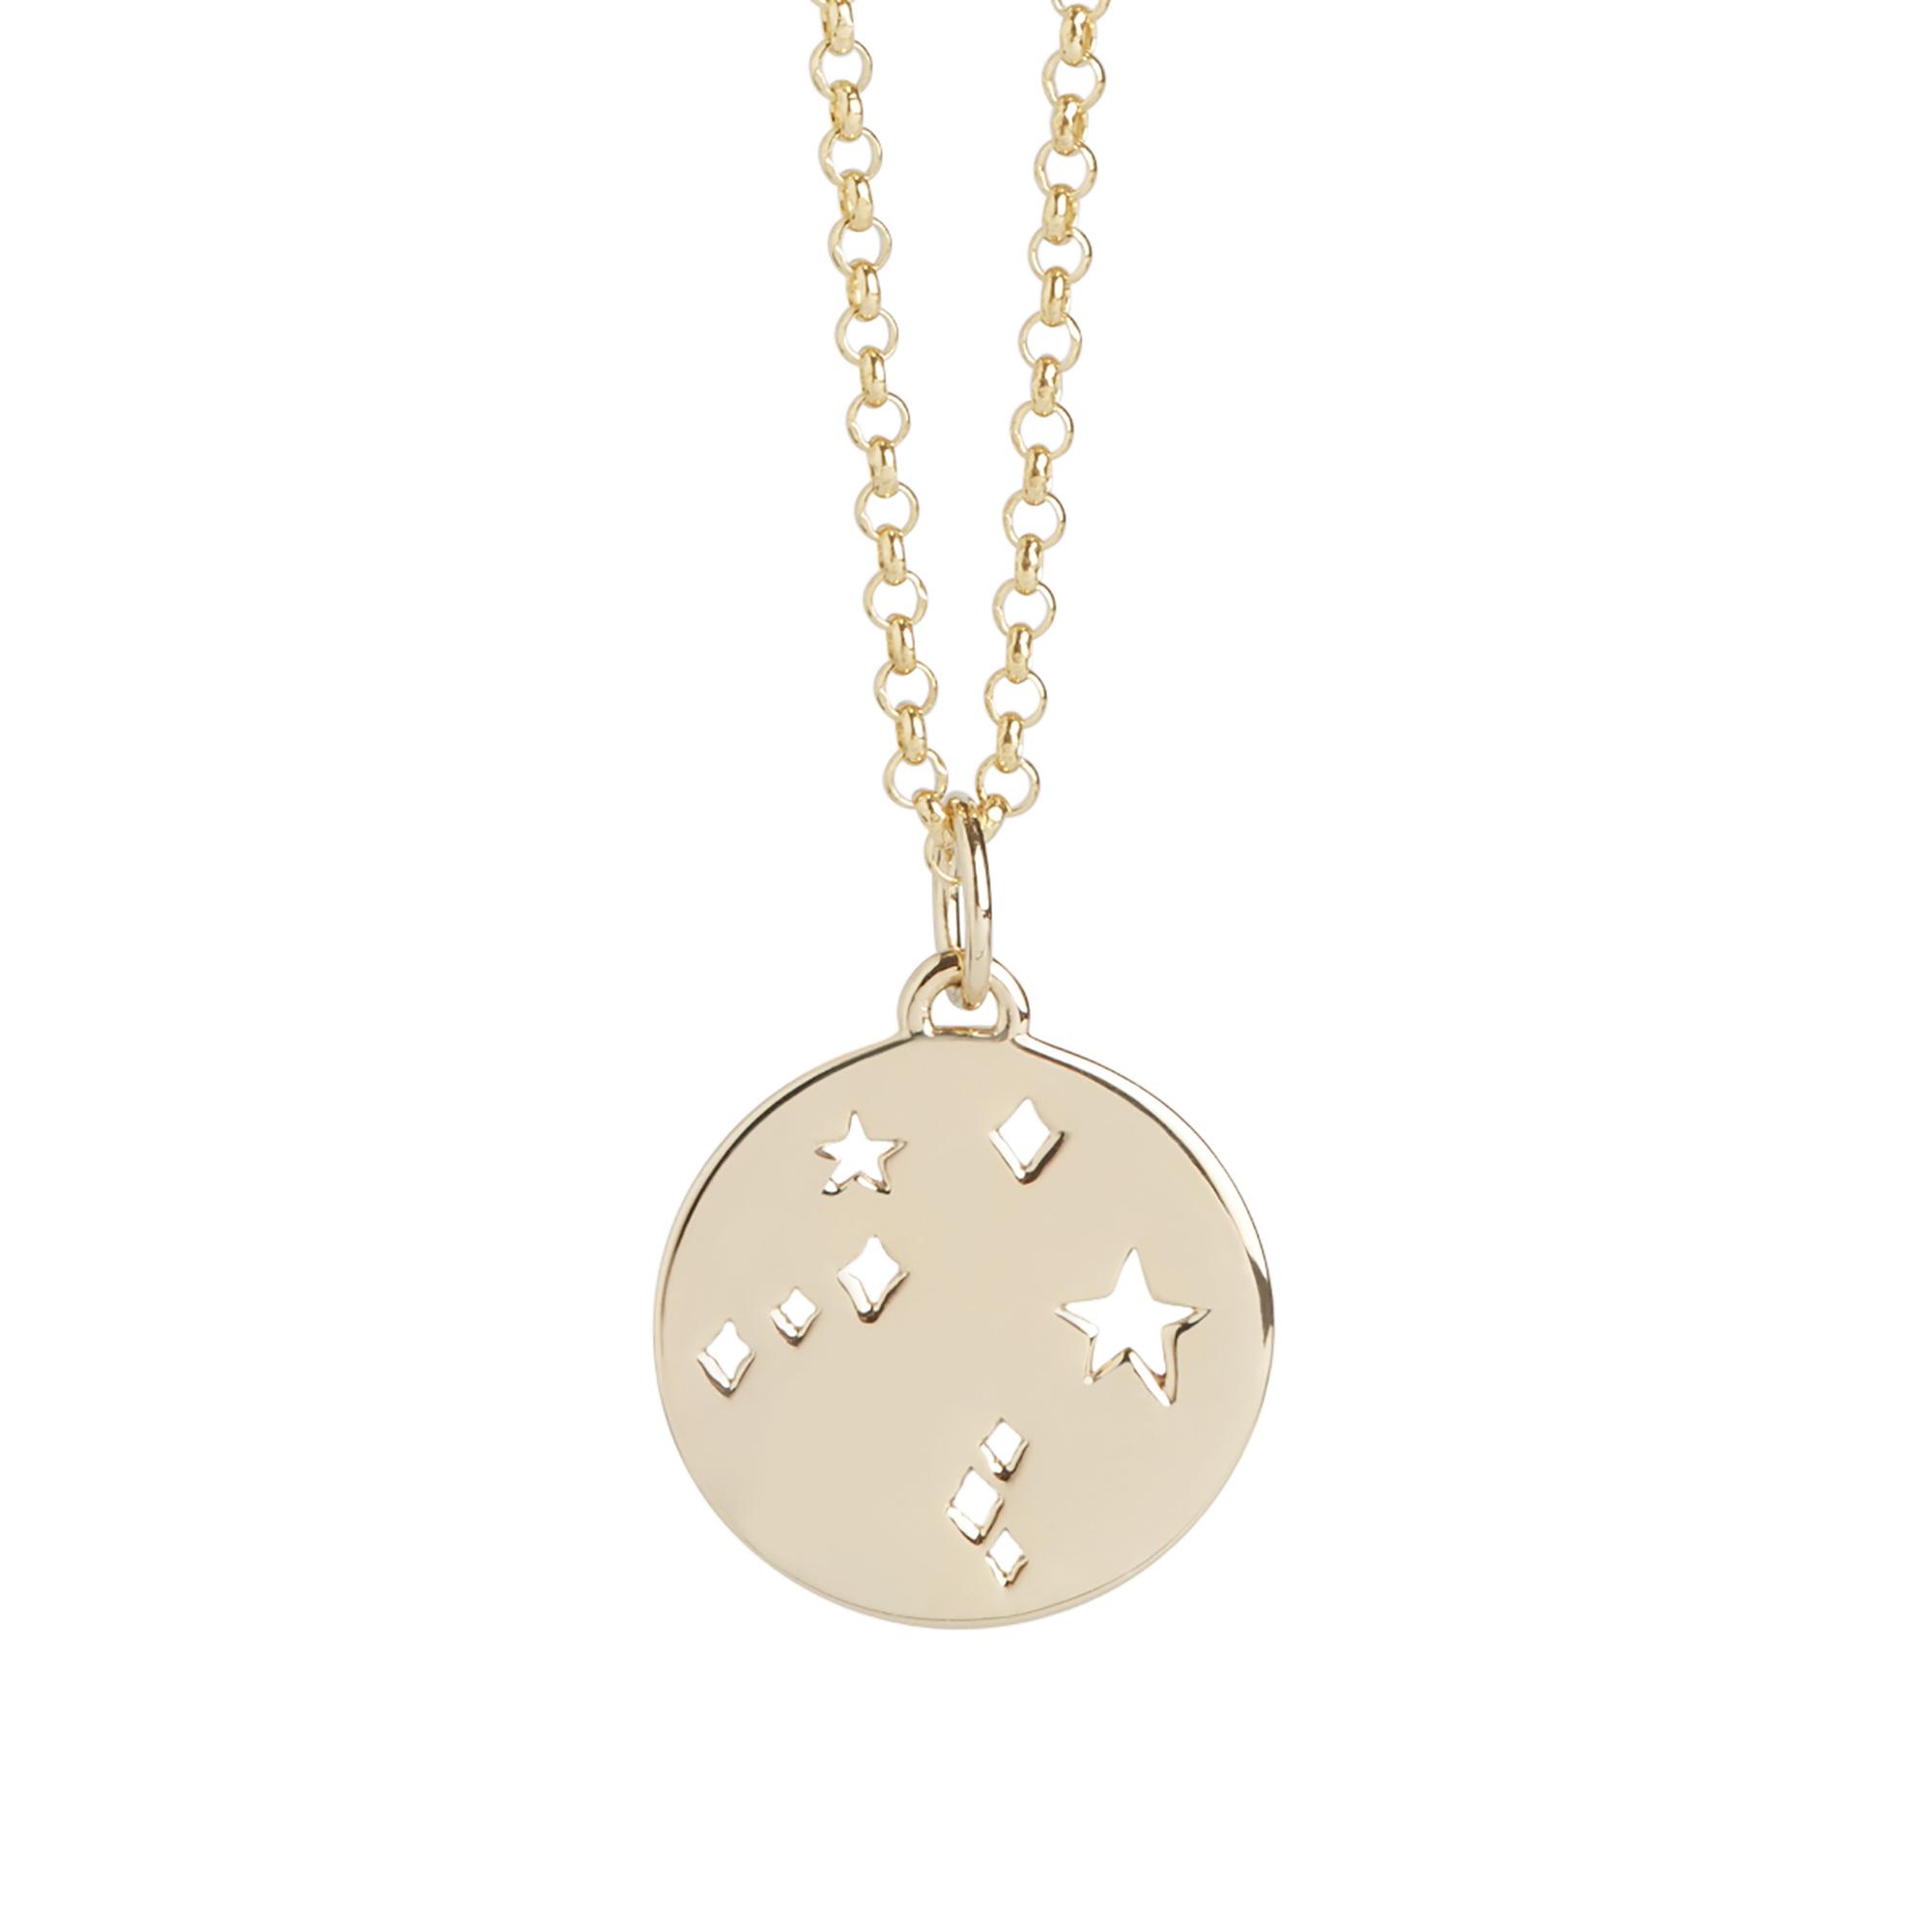 Muru Libra Star Sign Necklace Gold Plated